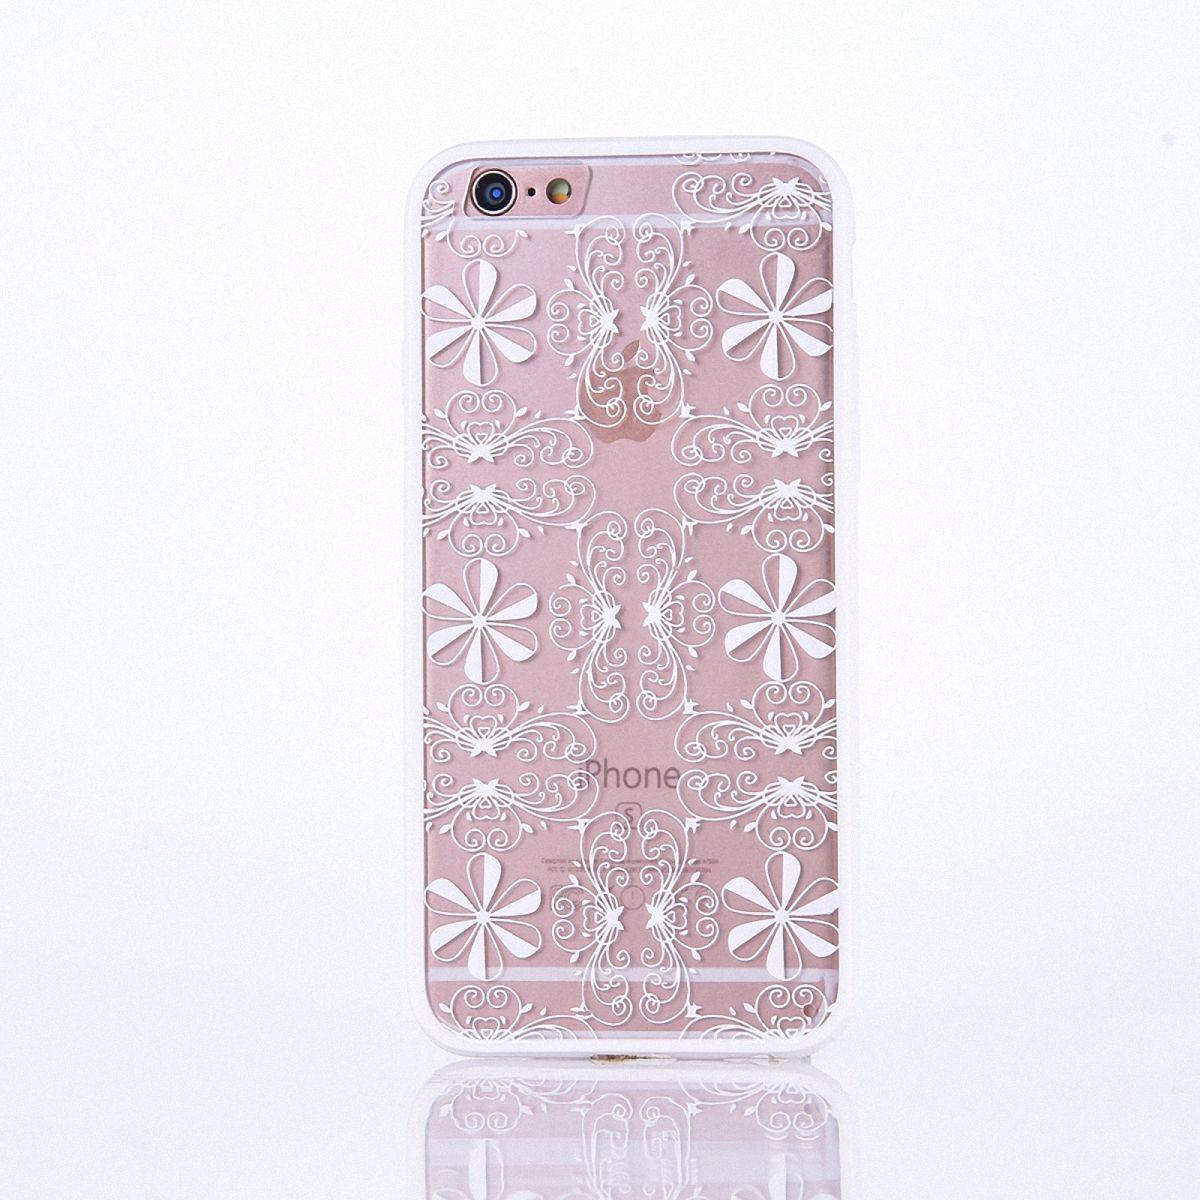 Handy Hülle Mandala für Apple iPhone SE 2020 Design Case Schutzhülle Motiv Ornamente Cover Tasche Bumper Weiß